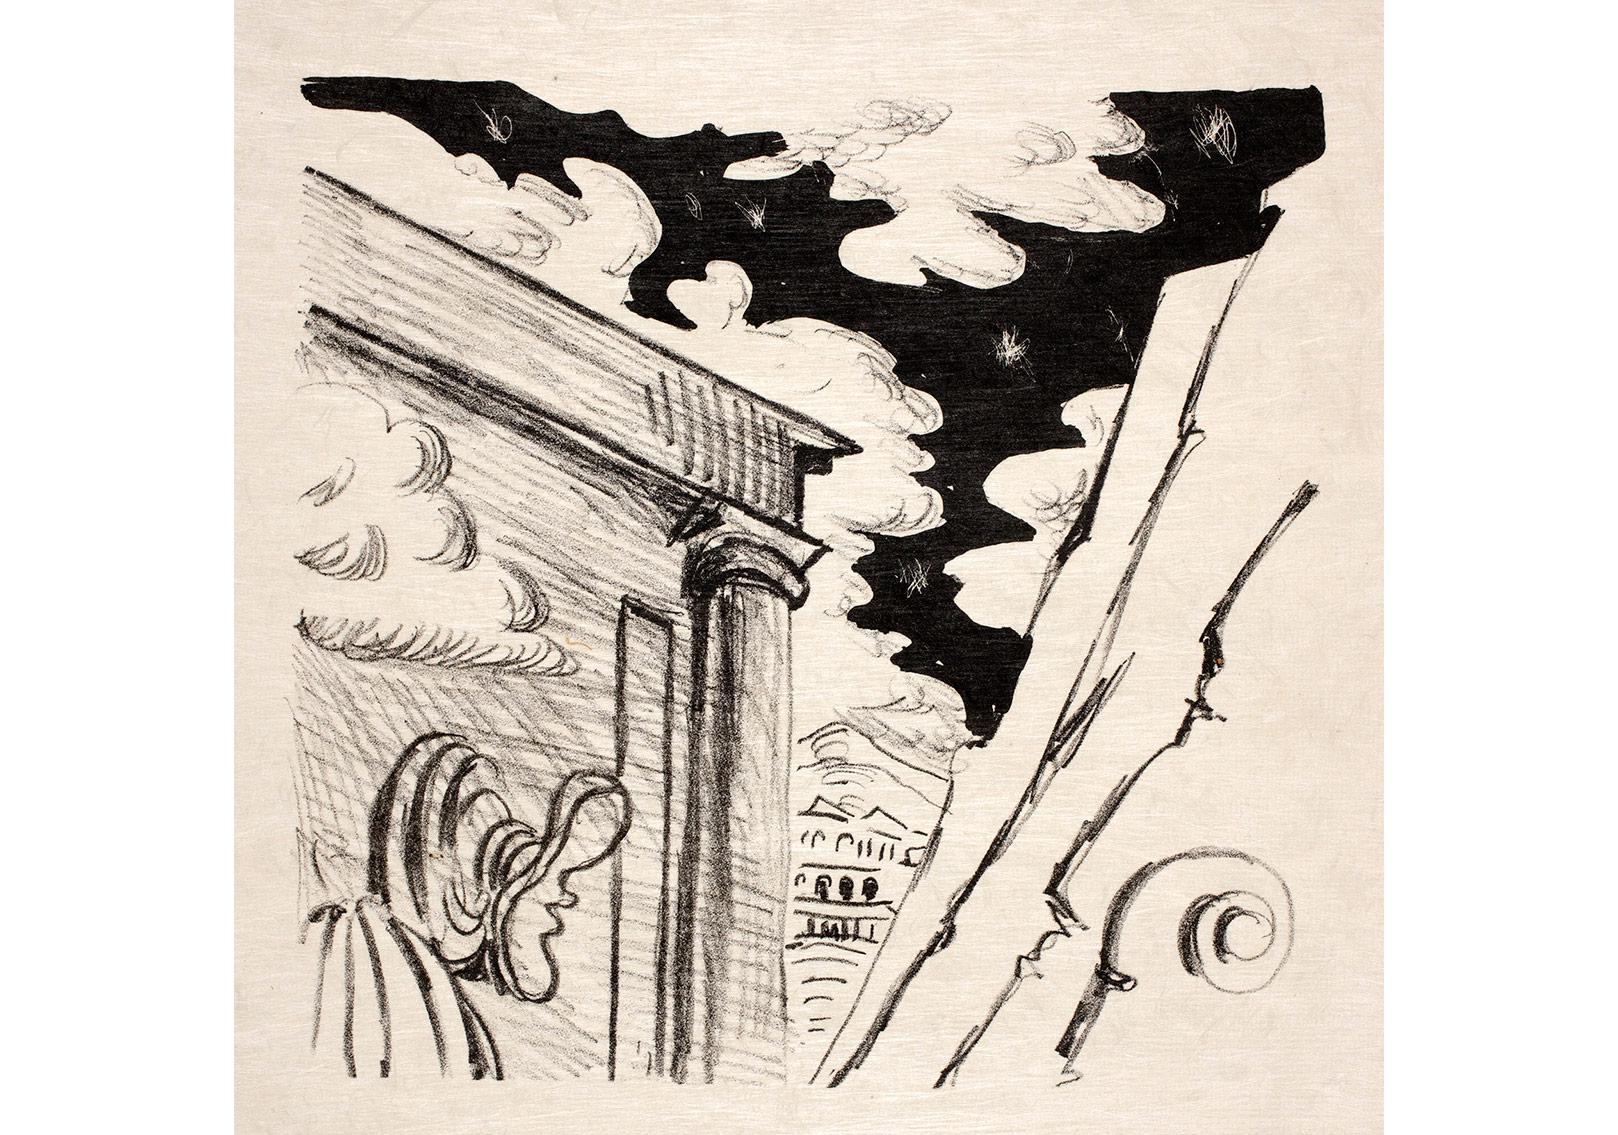 Kaligramlar, G. ApollinaireÉdition Gallimard, Paris 193066 adet taşbaskı, her biri 34 x 26 cm. Giorgio ve Isa de Chirico Vakfı Koleksiyon